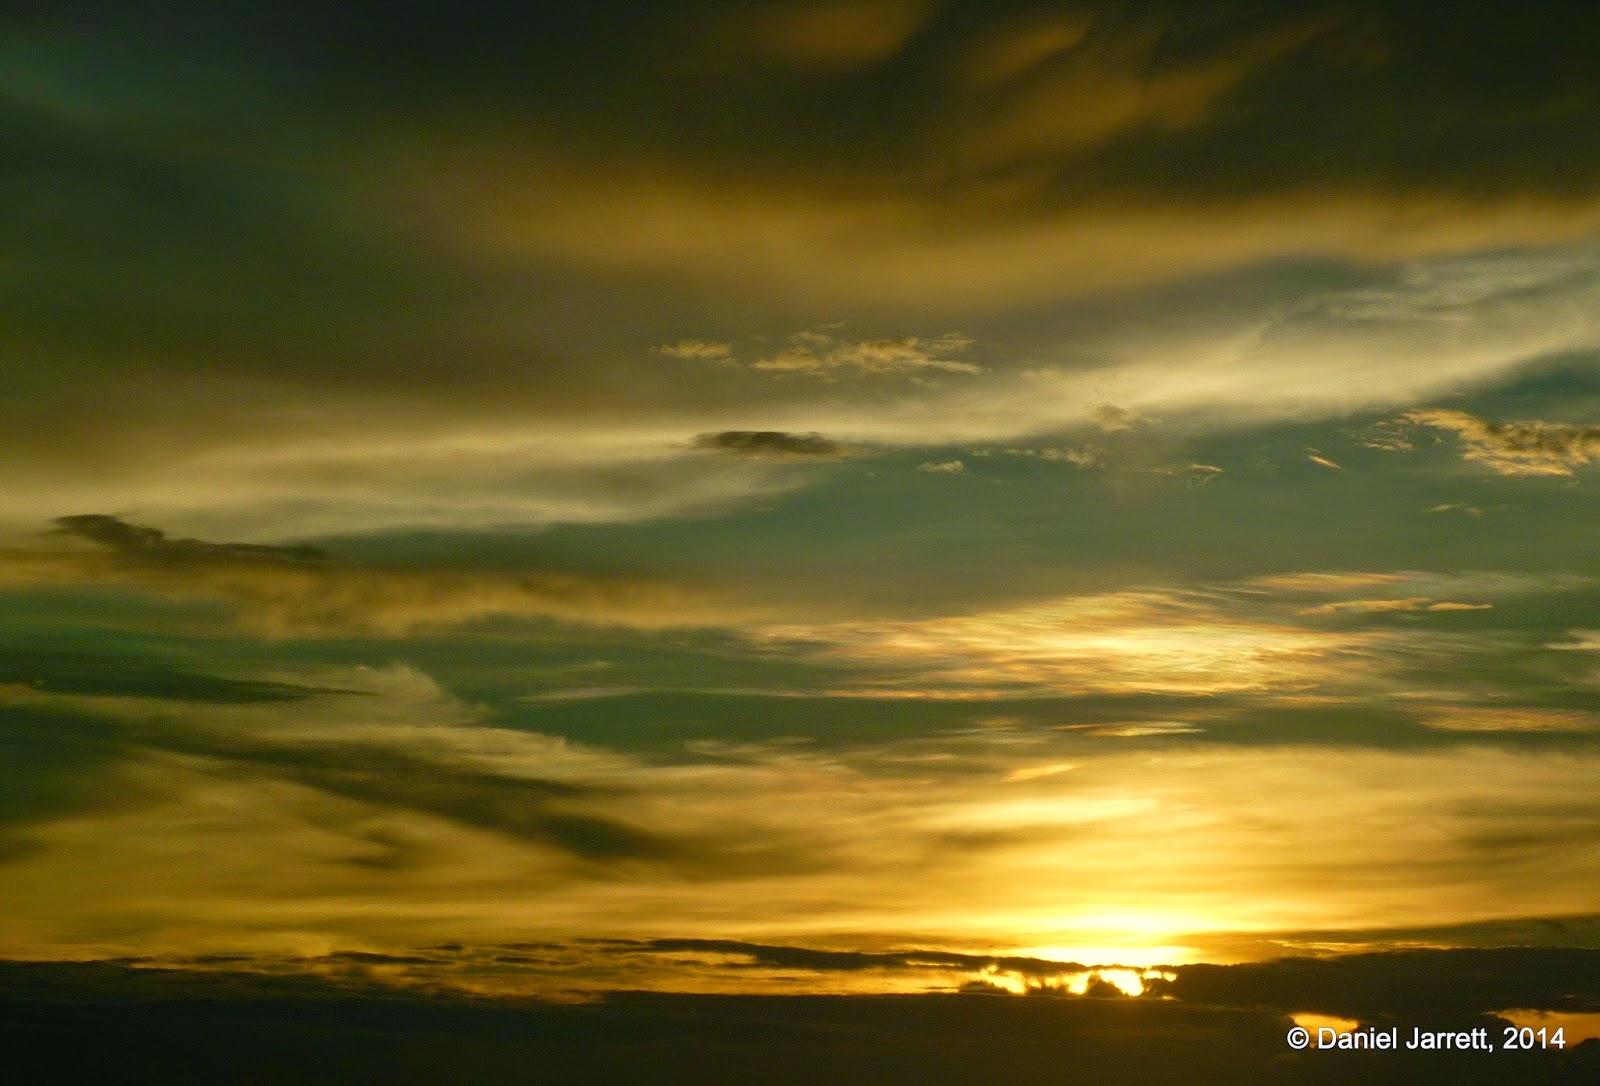 Sunset skies over Manila Bay